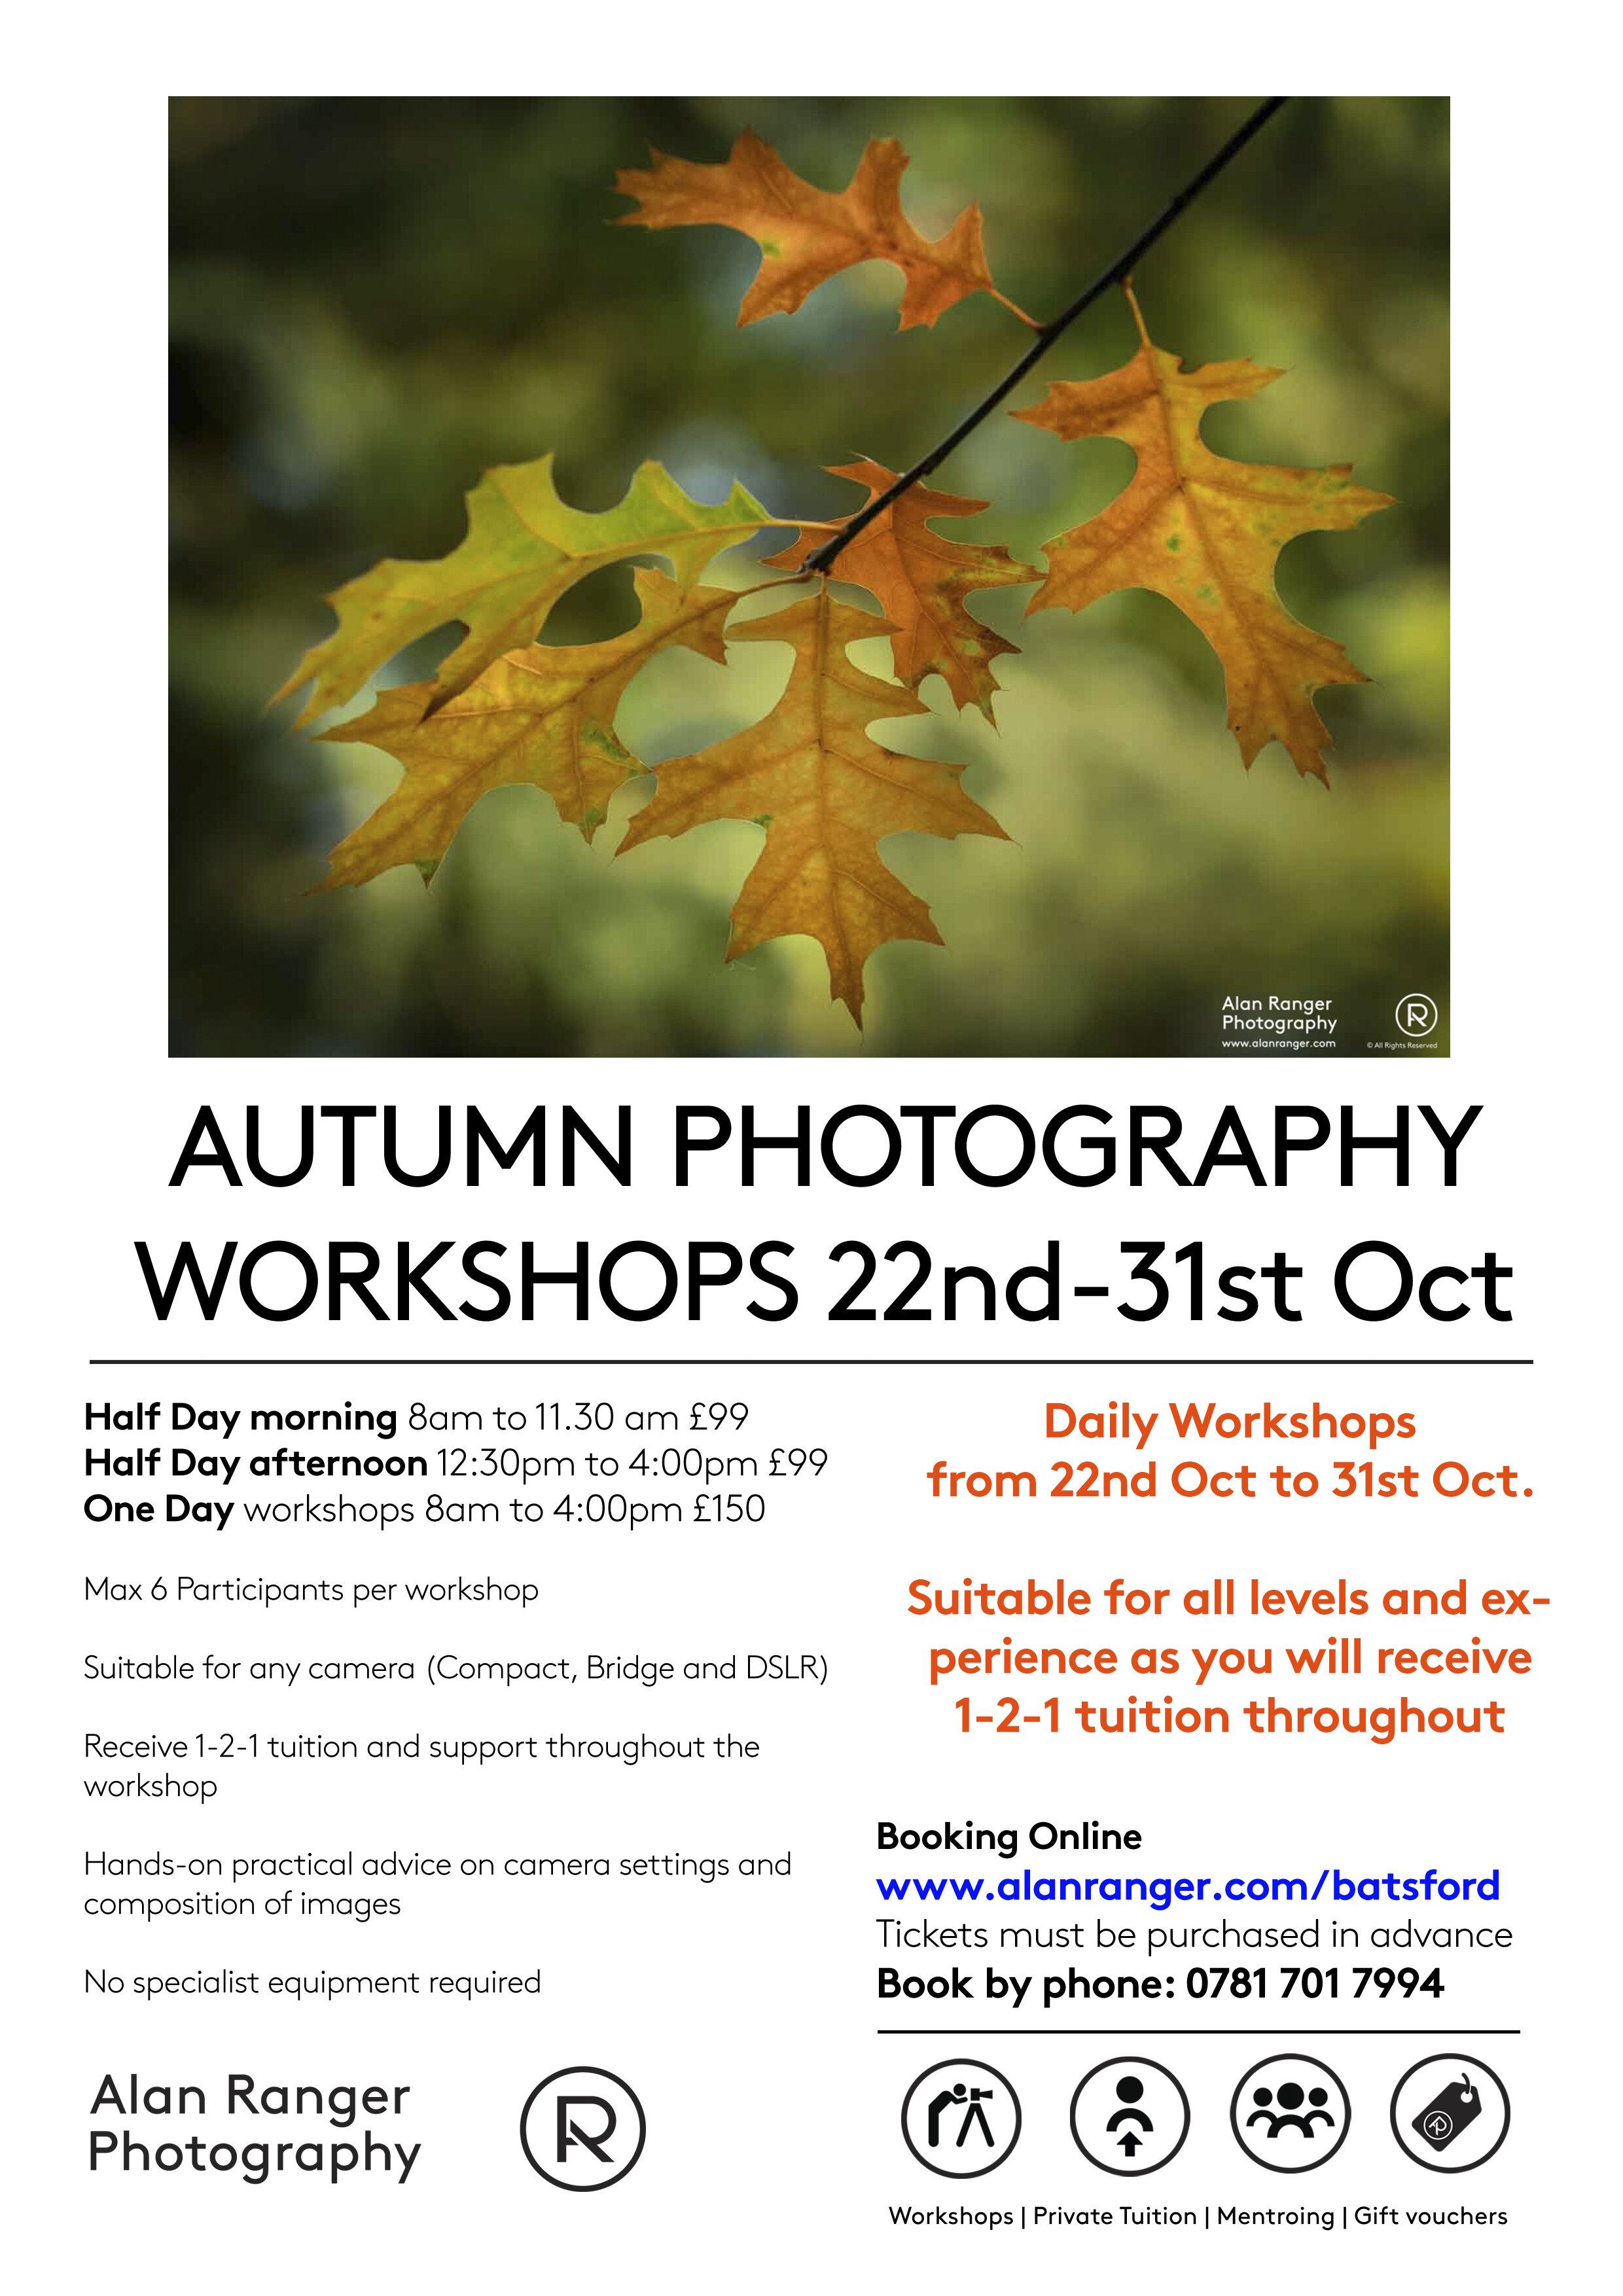 Batsford Photo Workshops Listing